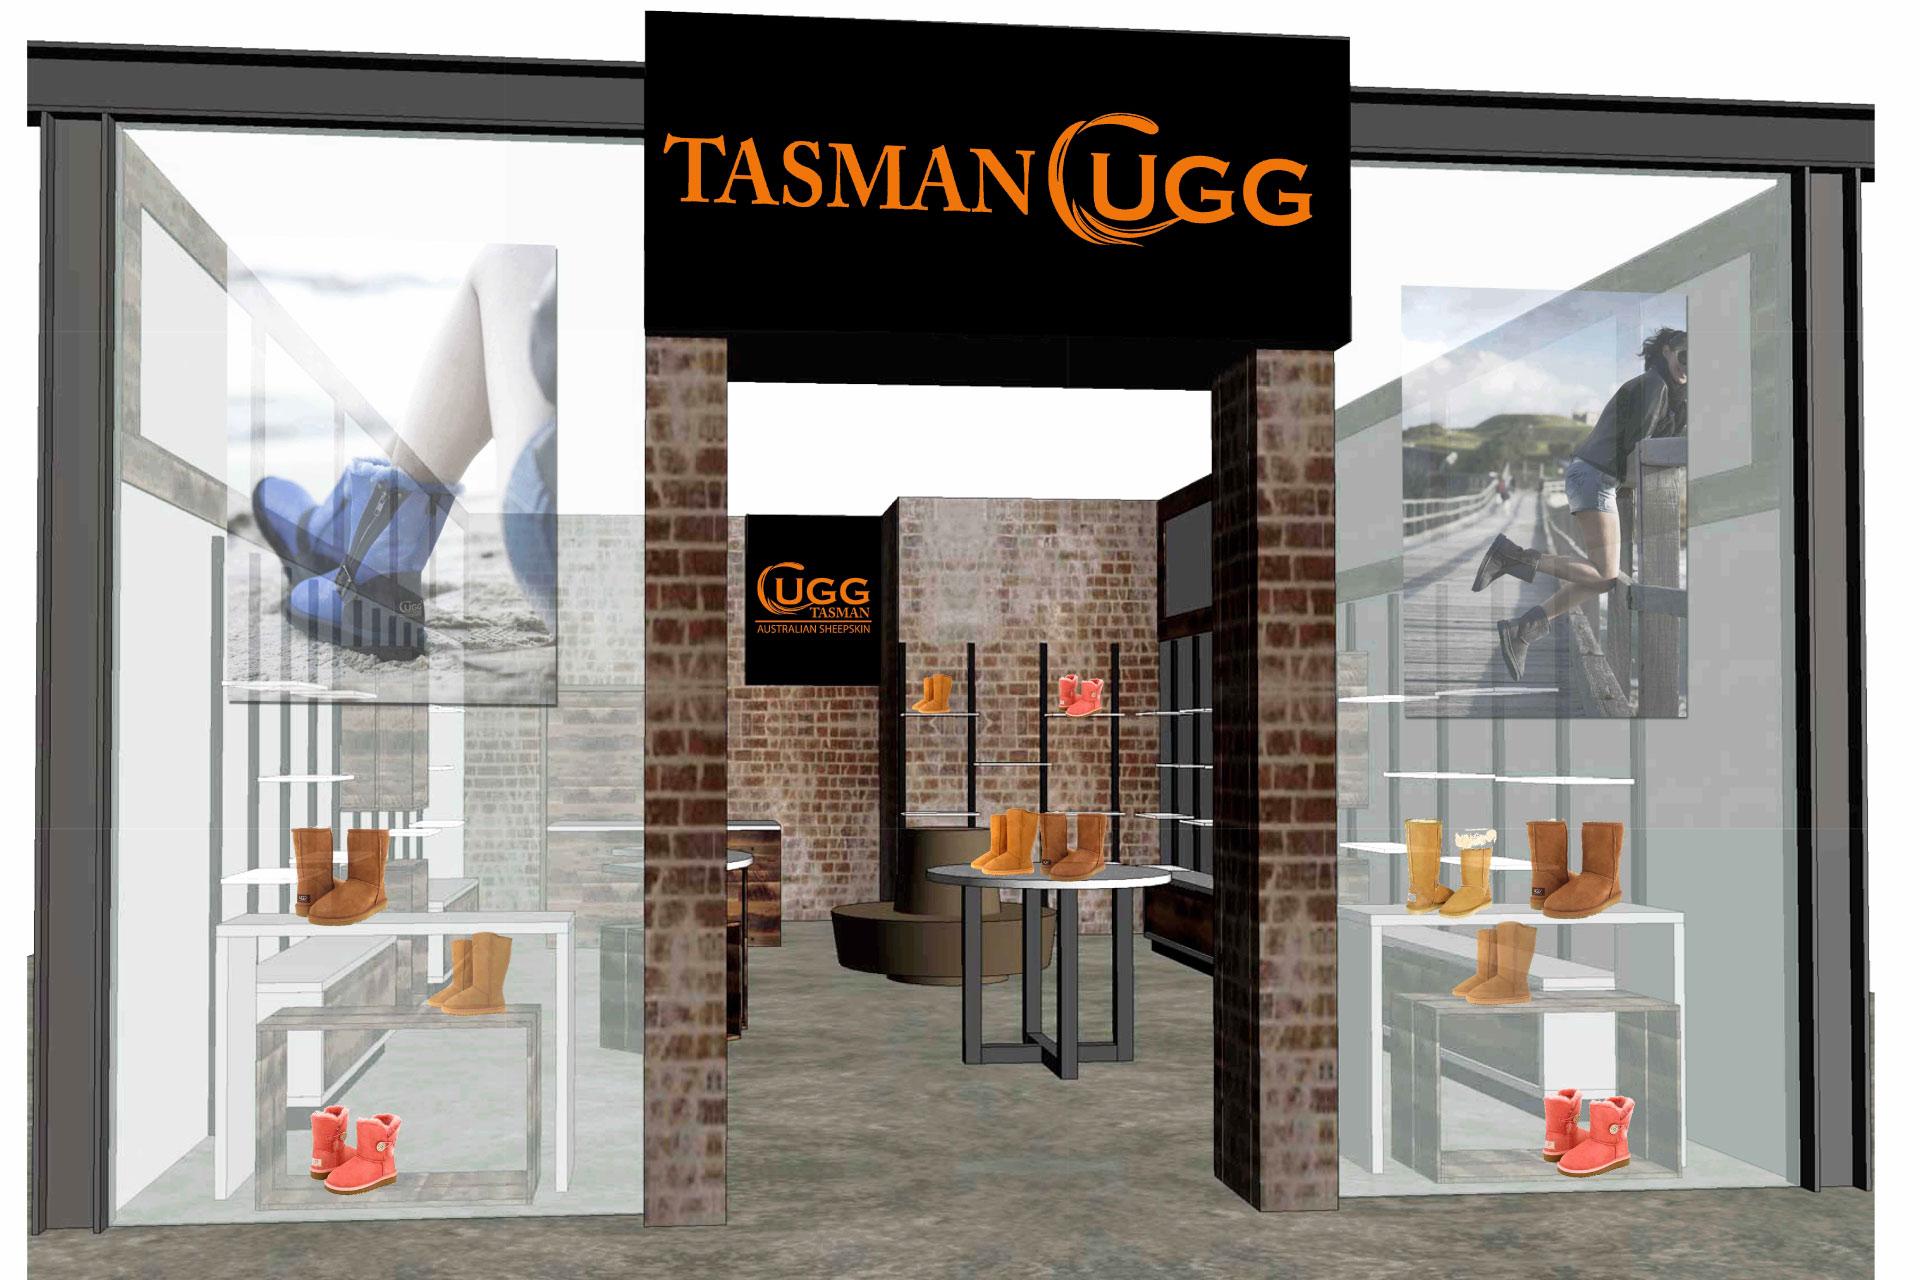 Corso Interior Architecture - Tasman Ugg